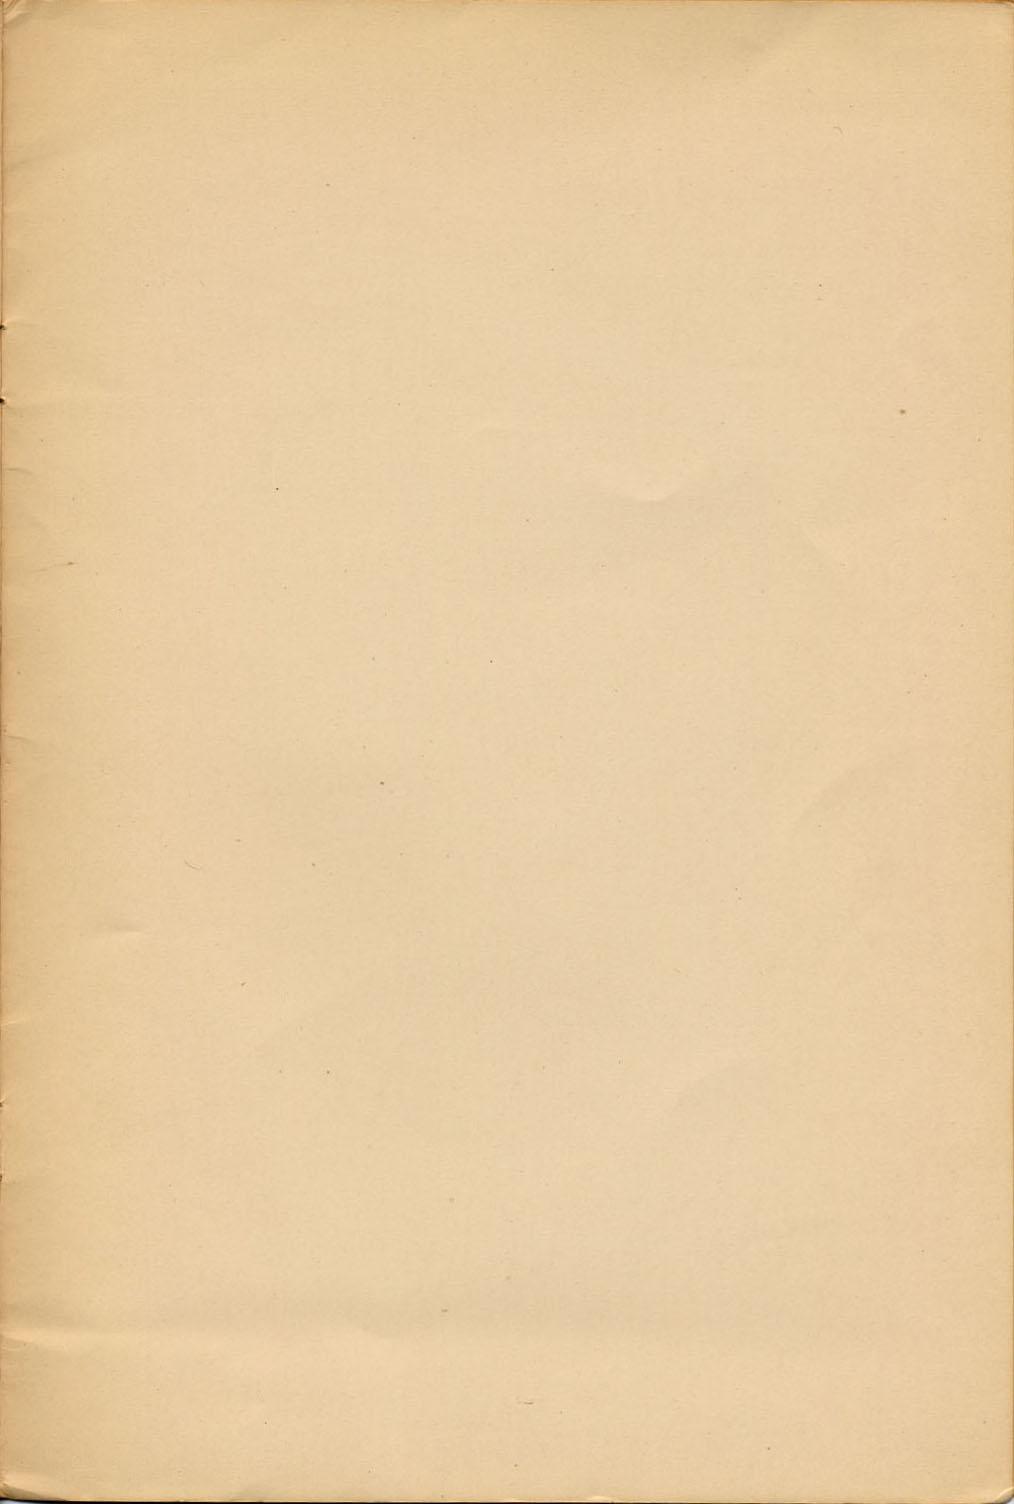 Rainwater blog: blank page